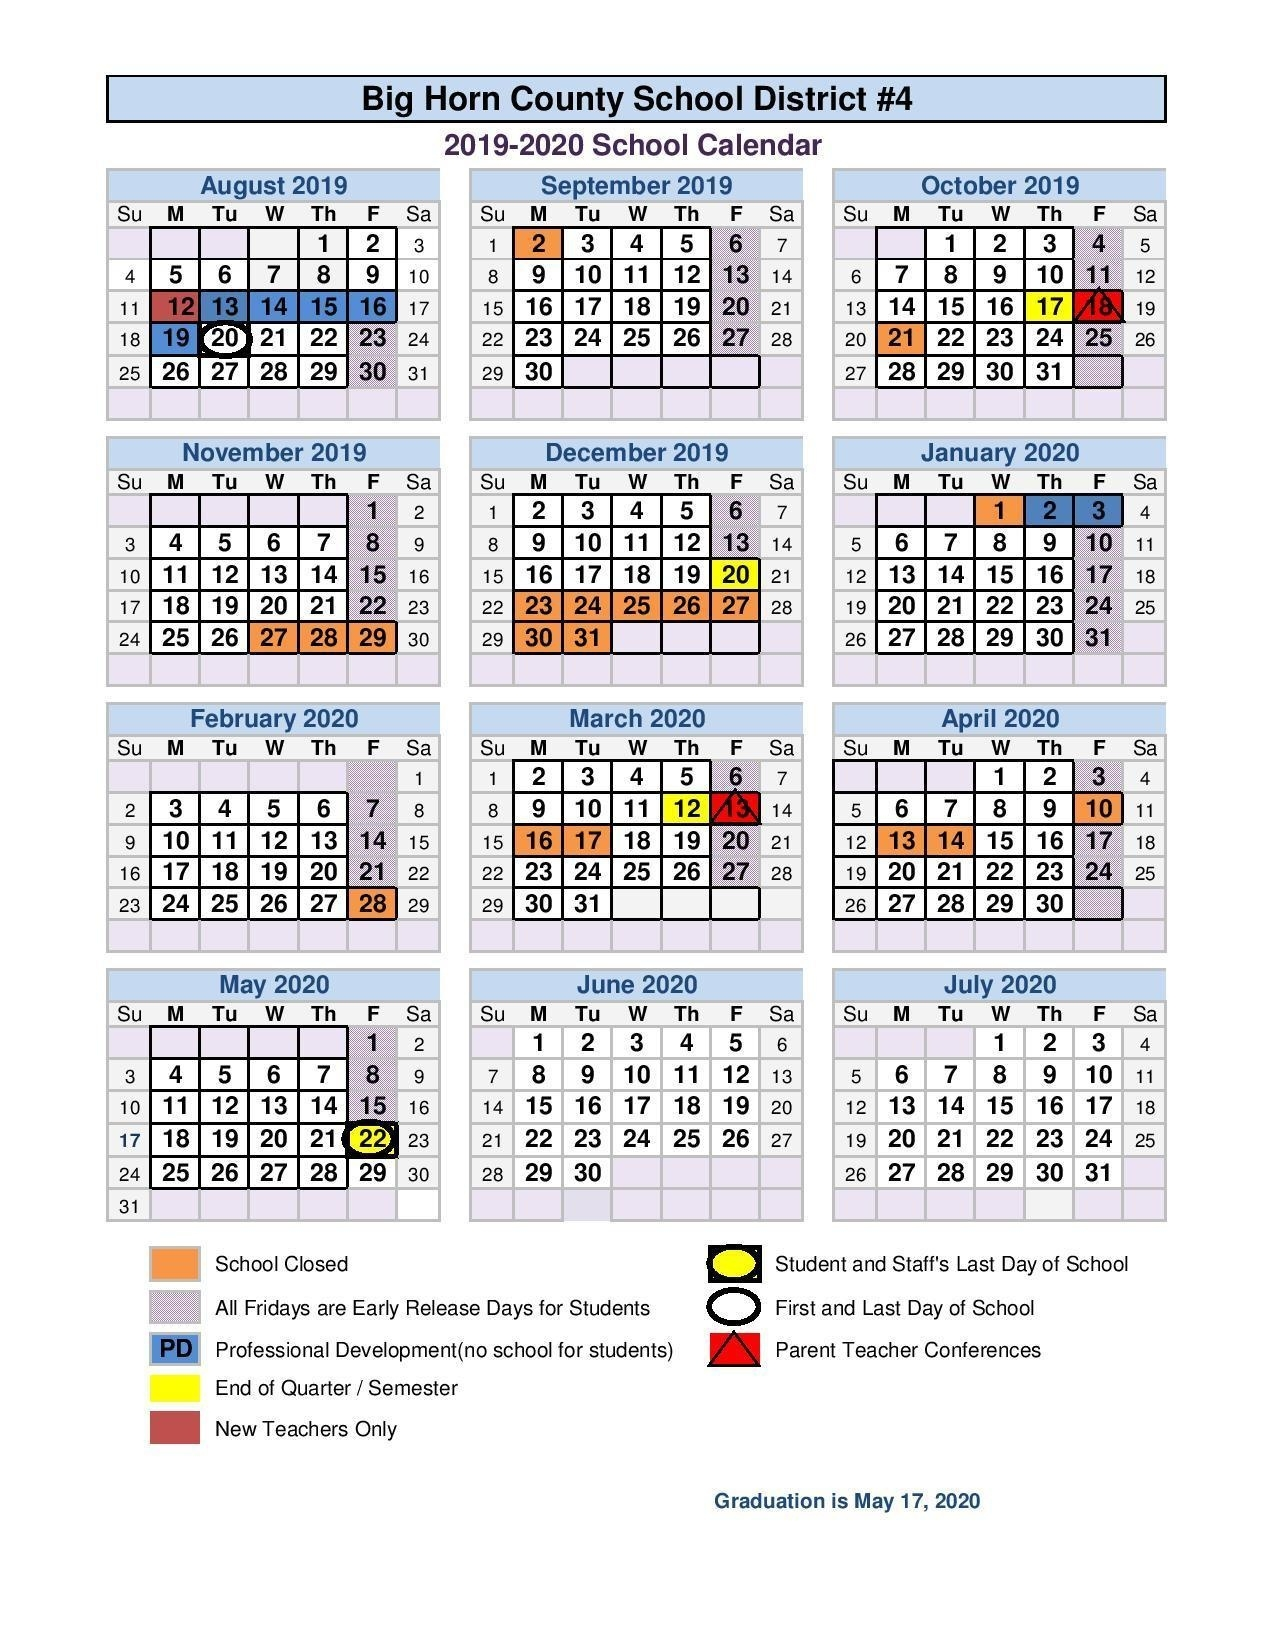 School Calendar_Number 4 School Calendar